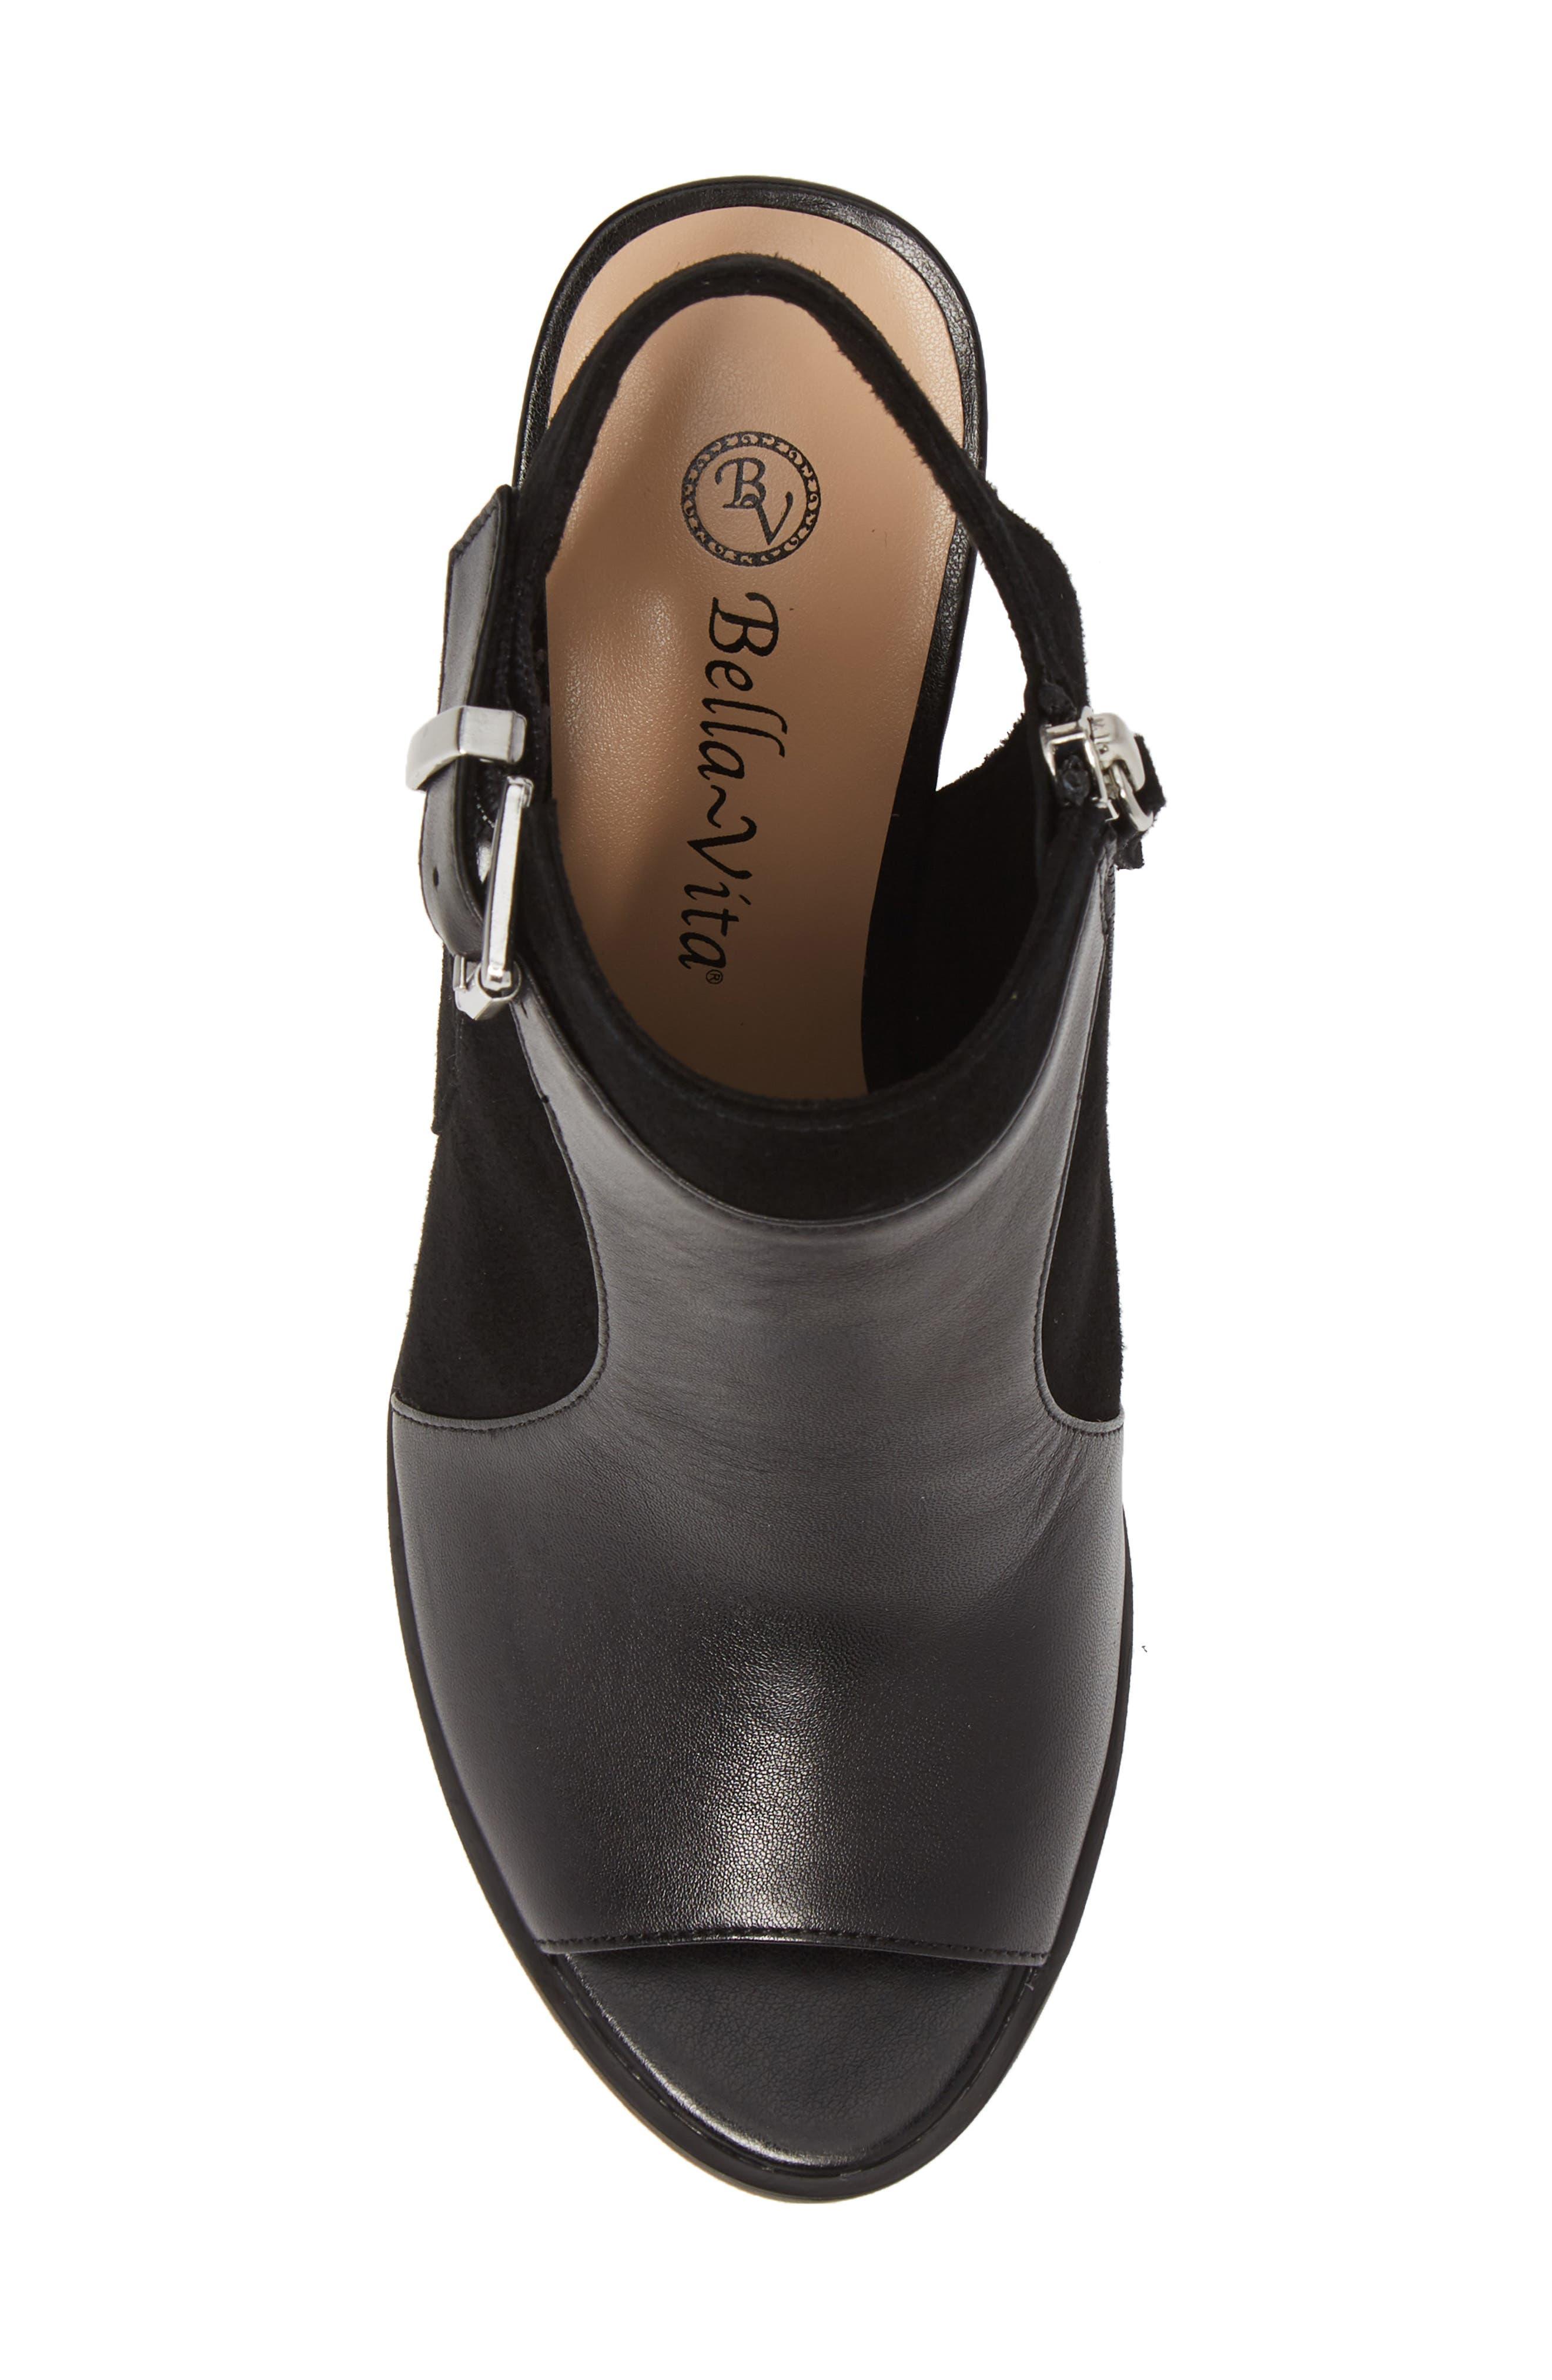 BELLA VITA, Kellan Mixed Finish Sandal, Alternate thumbnail 5, color, BLACK LEATHER/ SUEDE